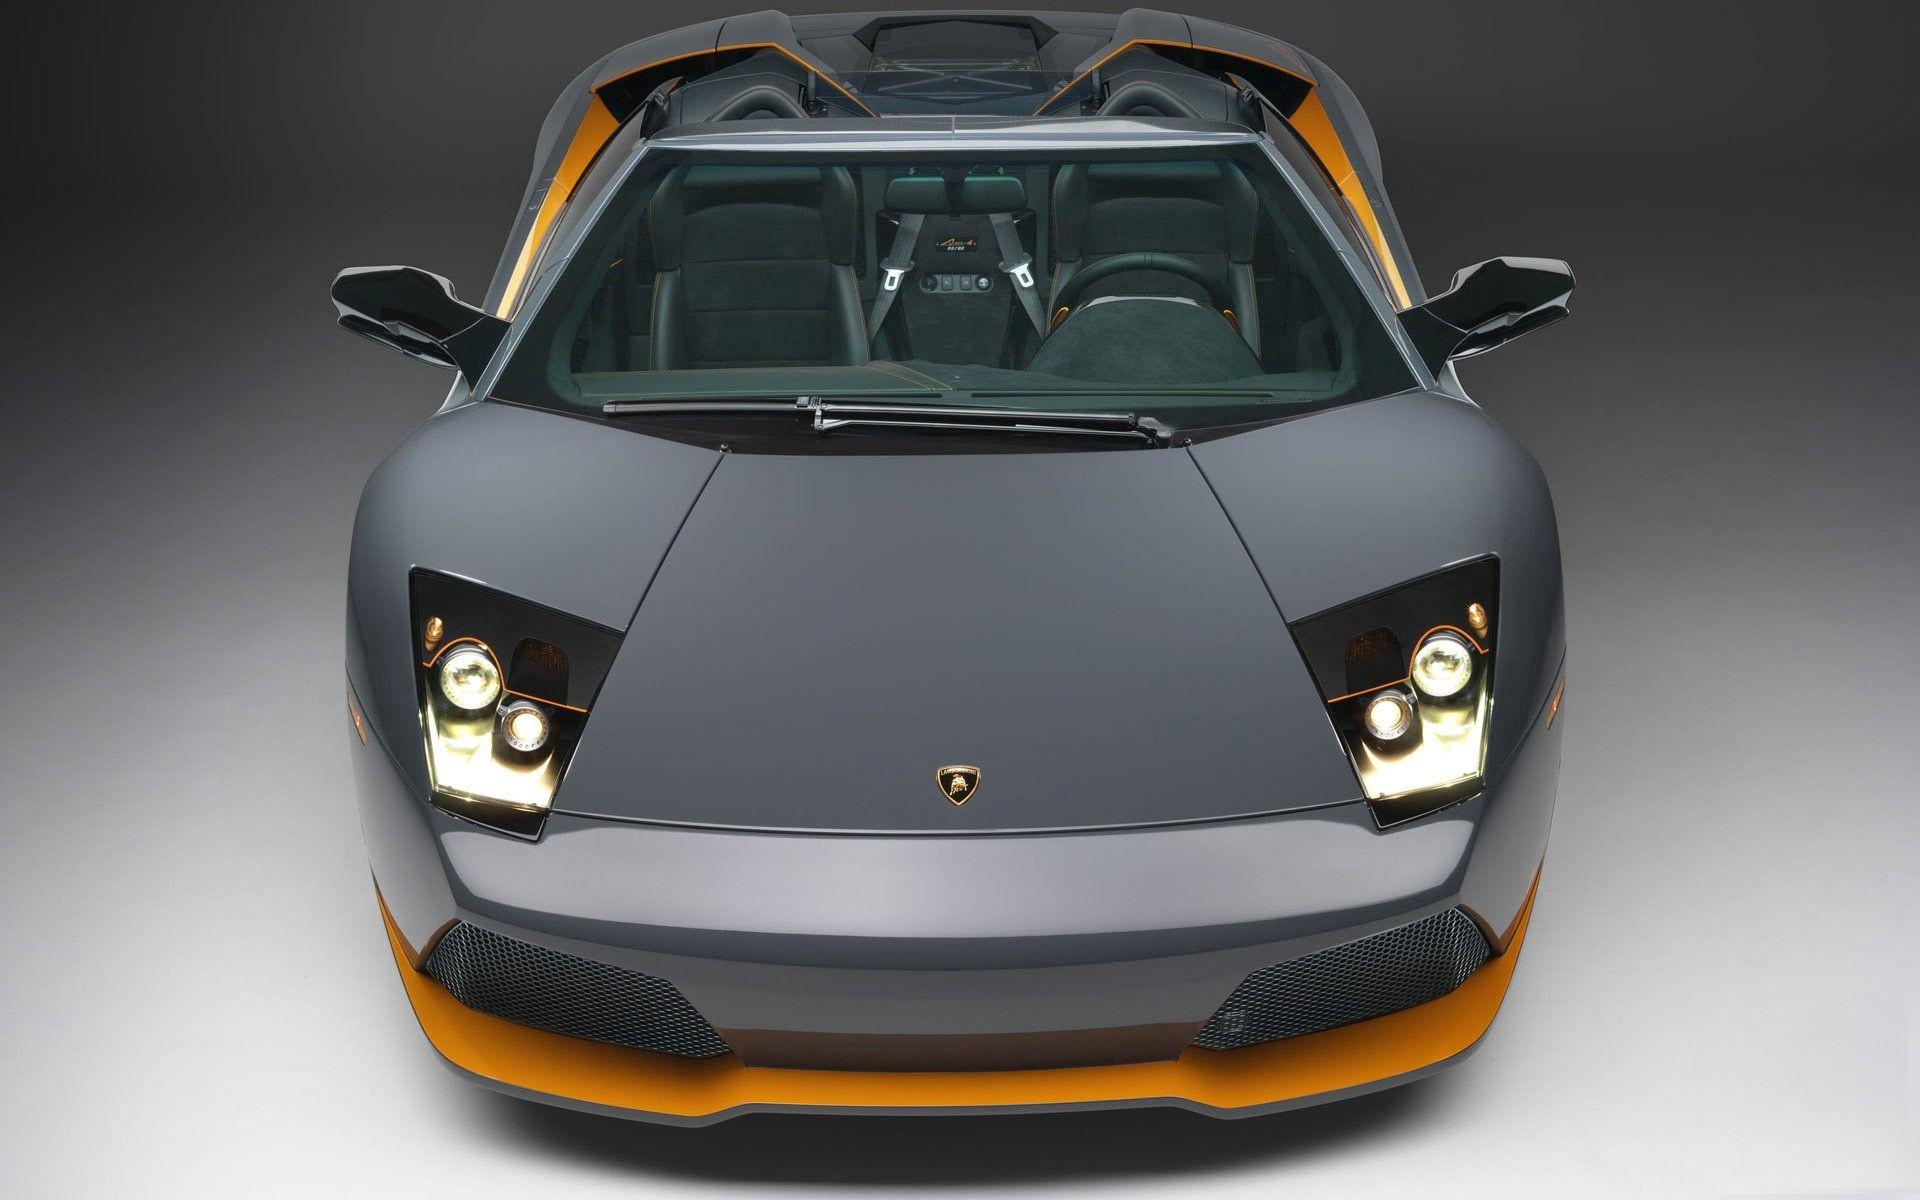 61242 Заставки и Обои Фары на телефон. Скачать Ламборджини (Lamborghini), Тачки (Cars), Фары, Ламборджини, Murcielago картинки бесплатно